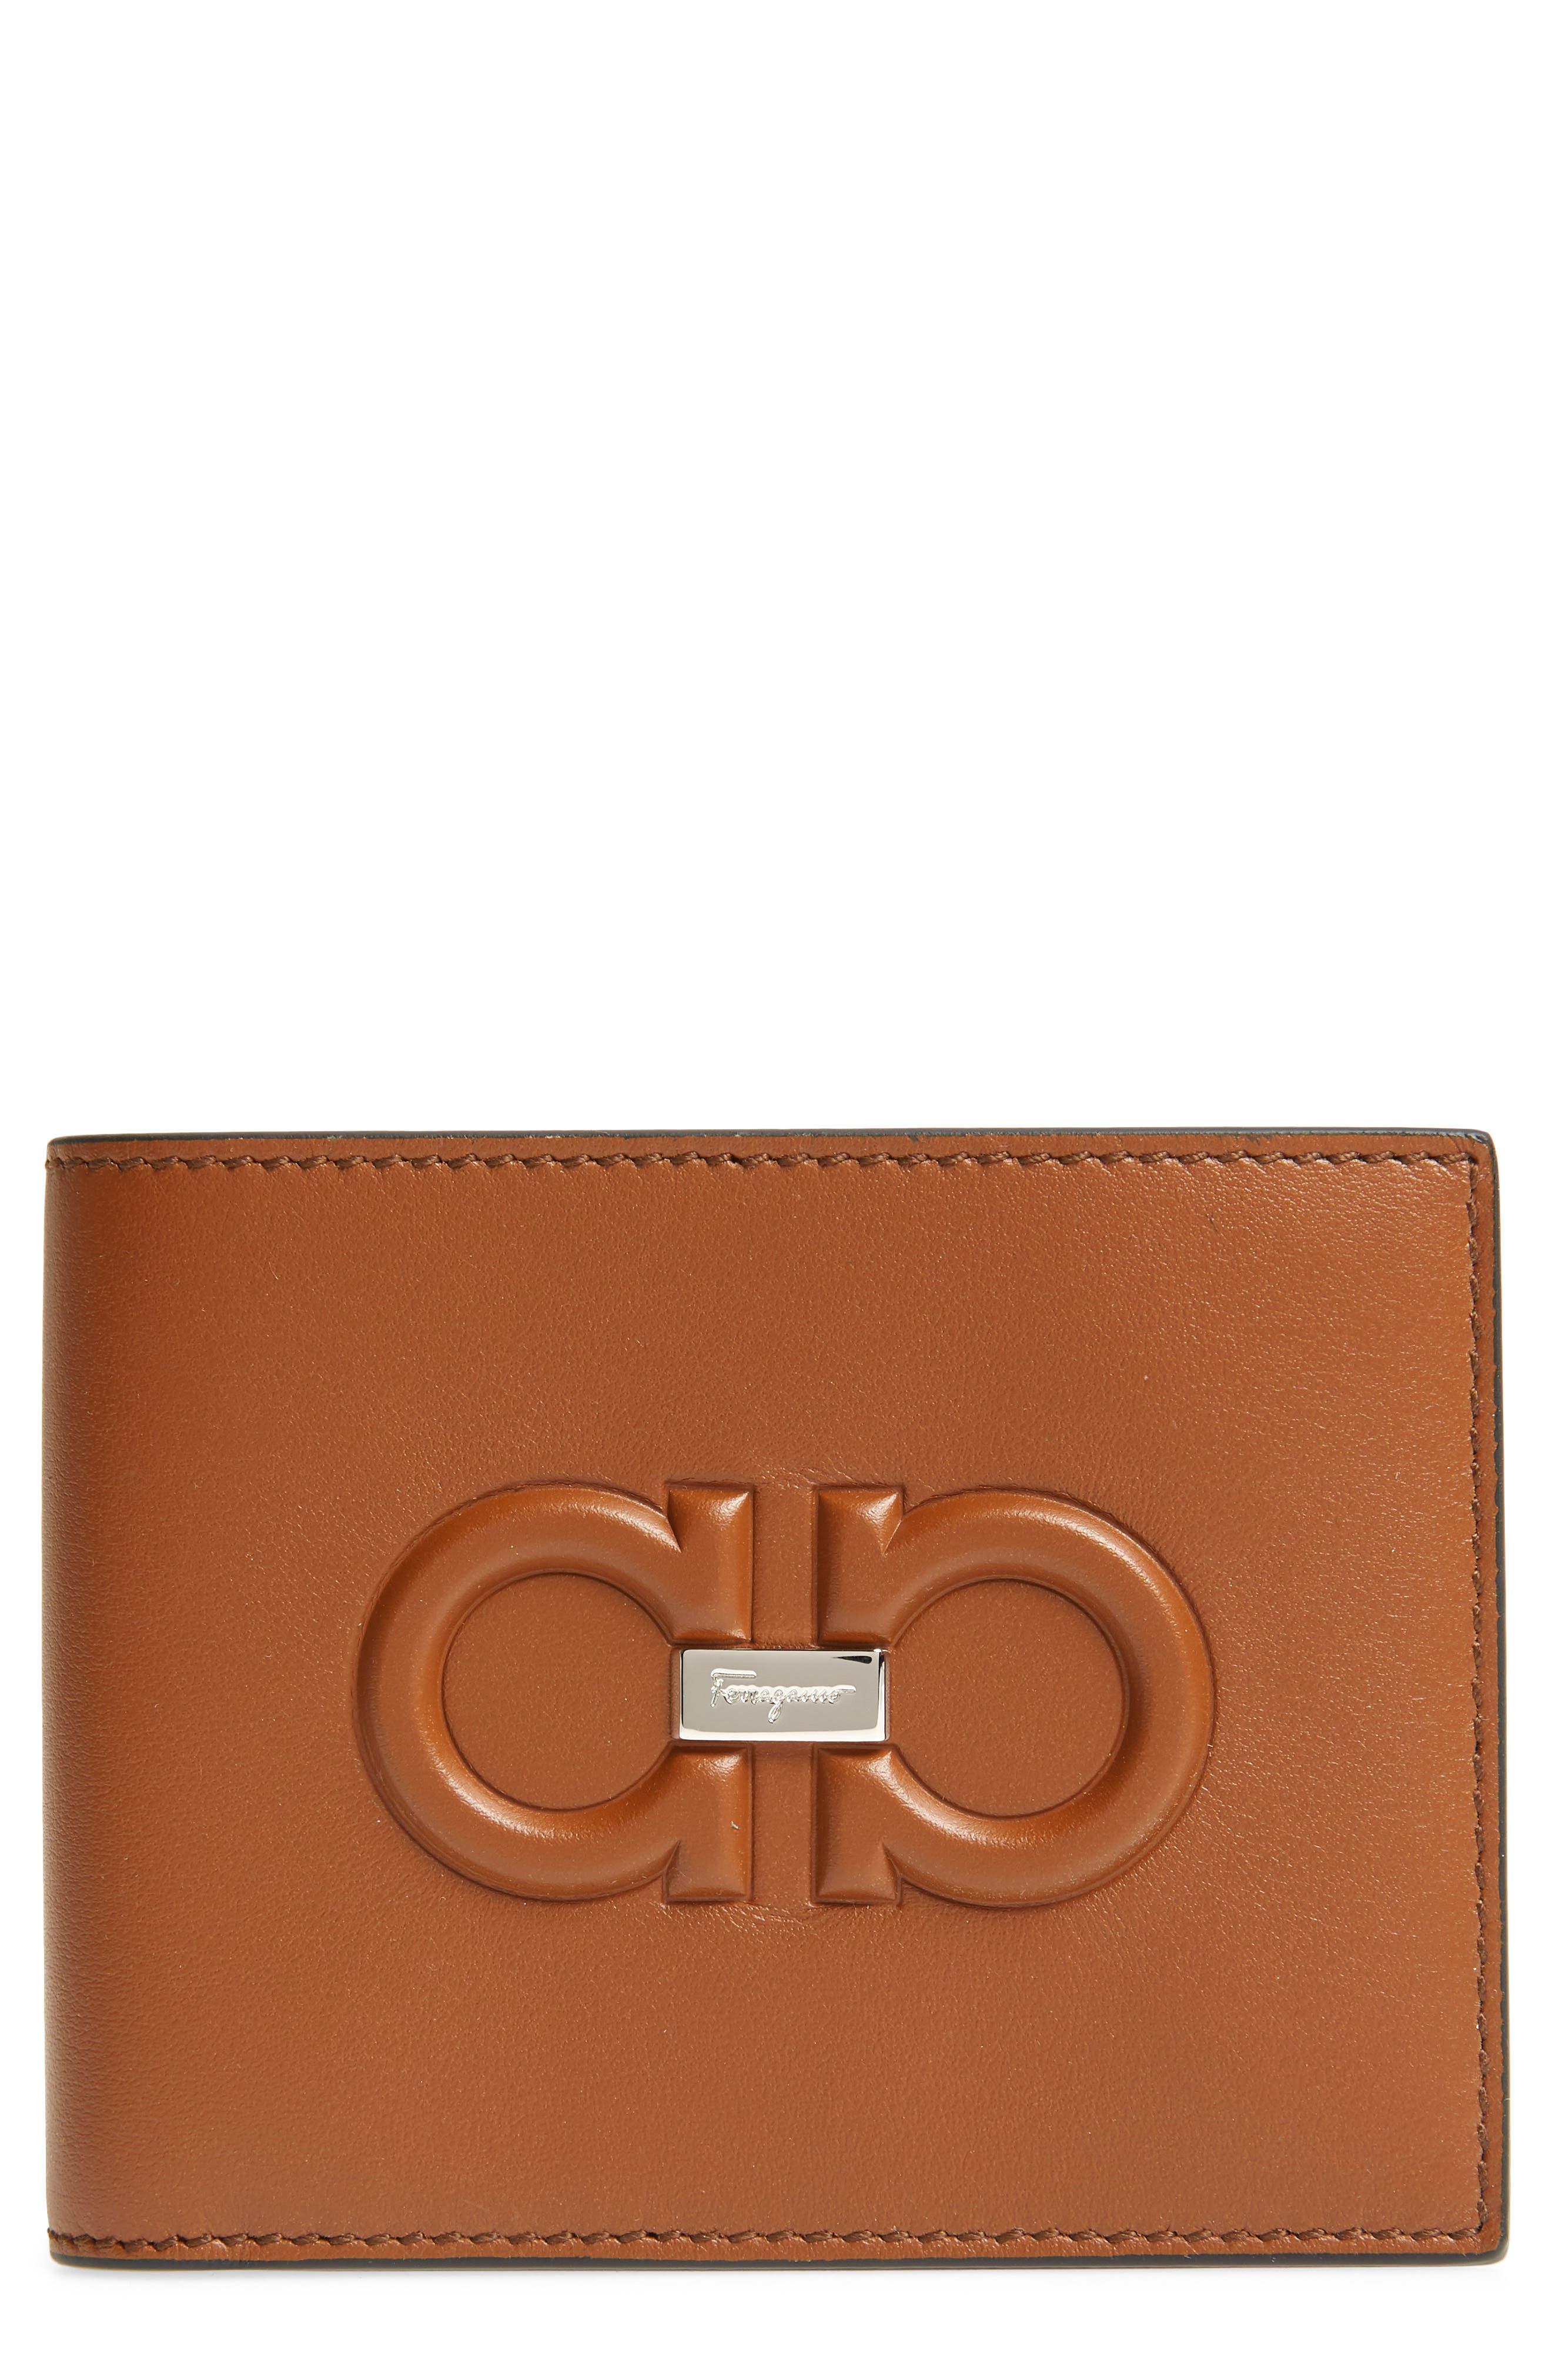 SALVATORE FERRAGAMO, Firenze Logo Leather Wallet, Main thumbnail 1, color, 200